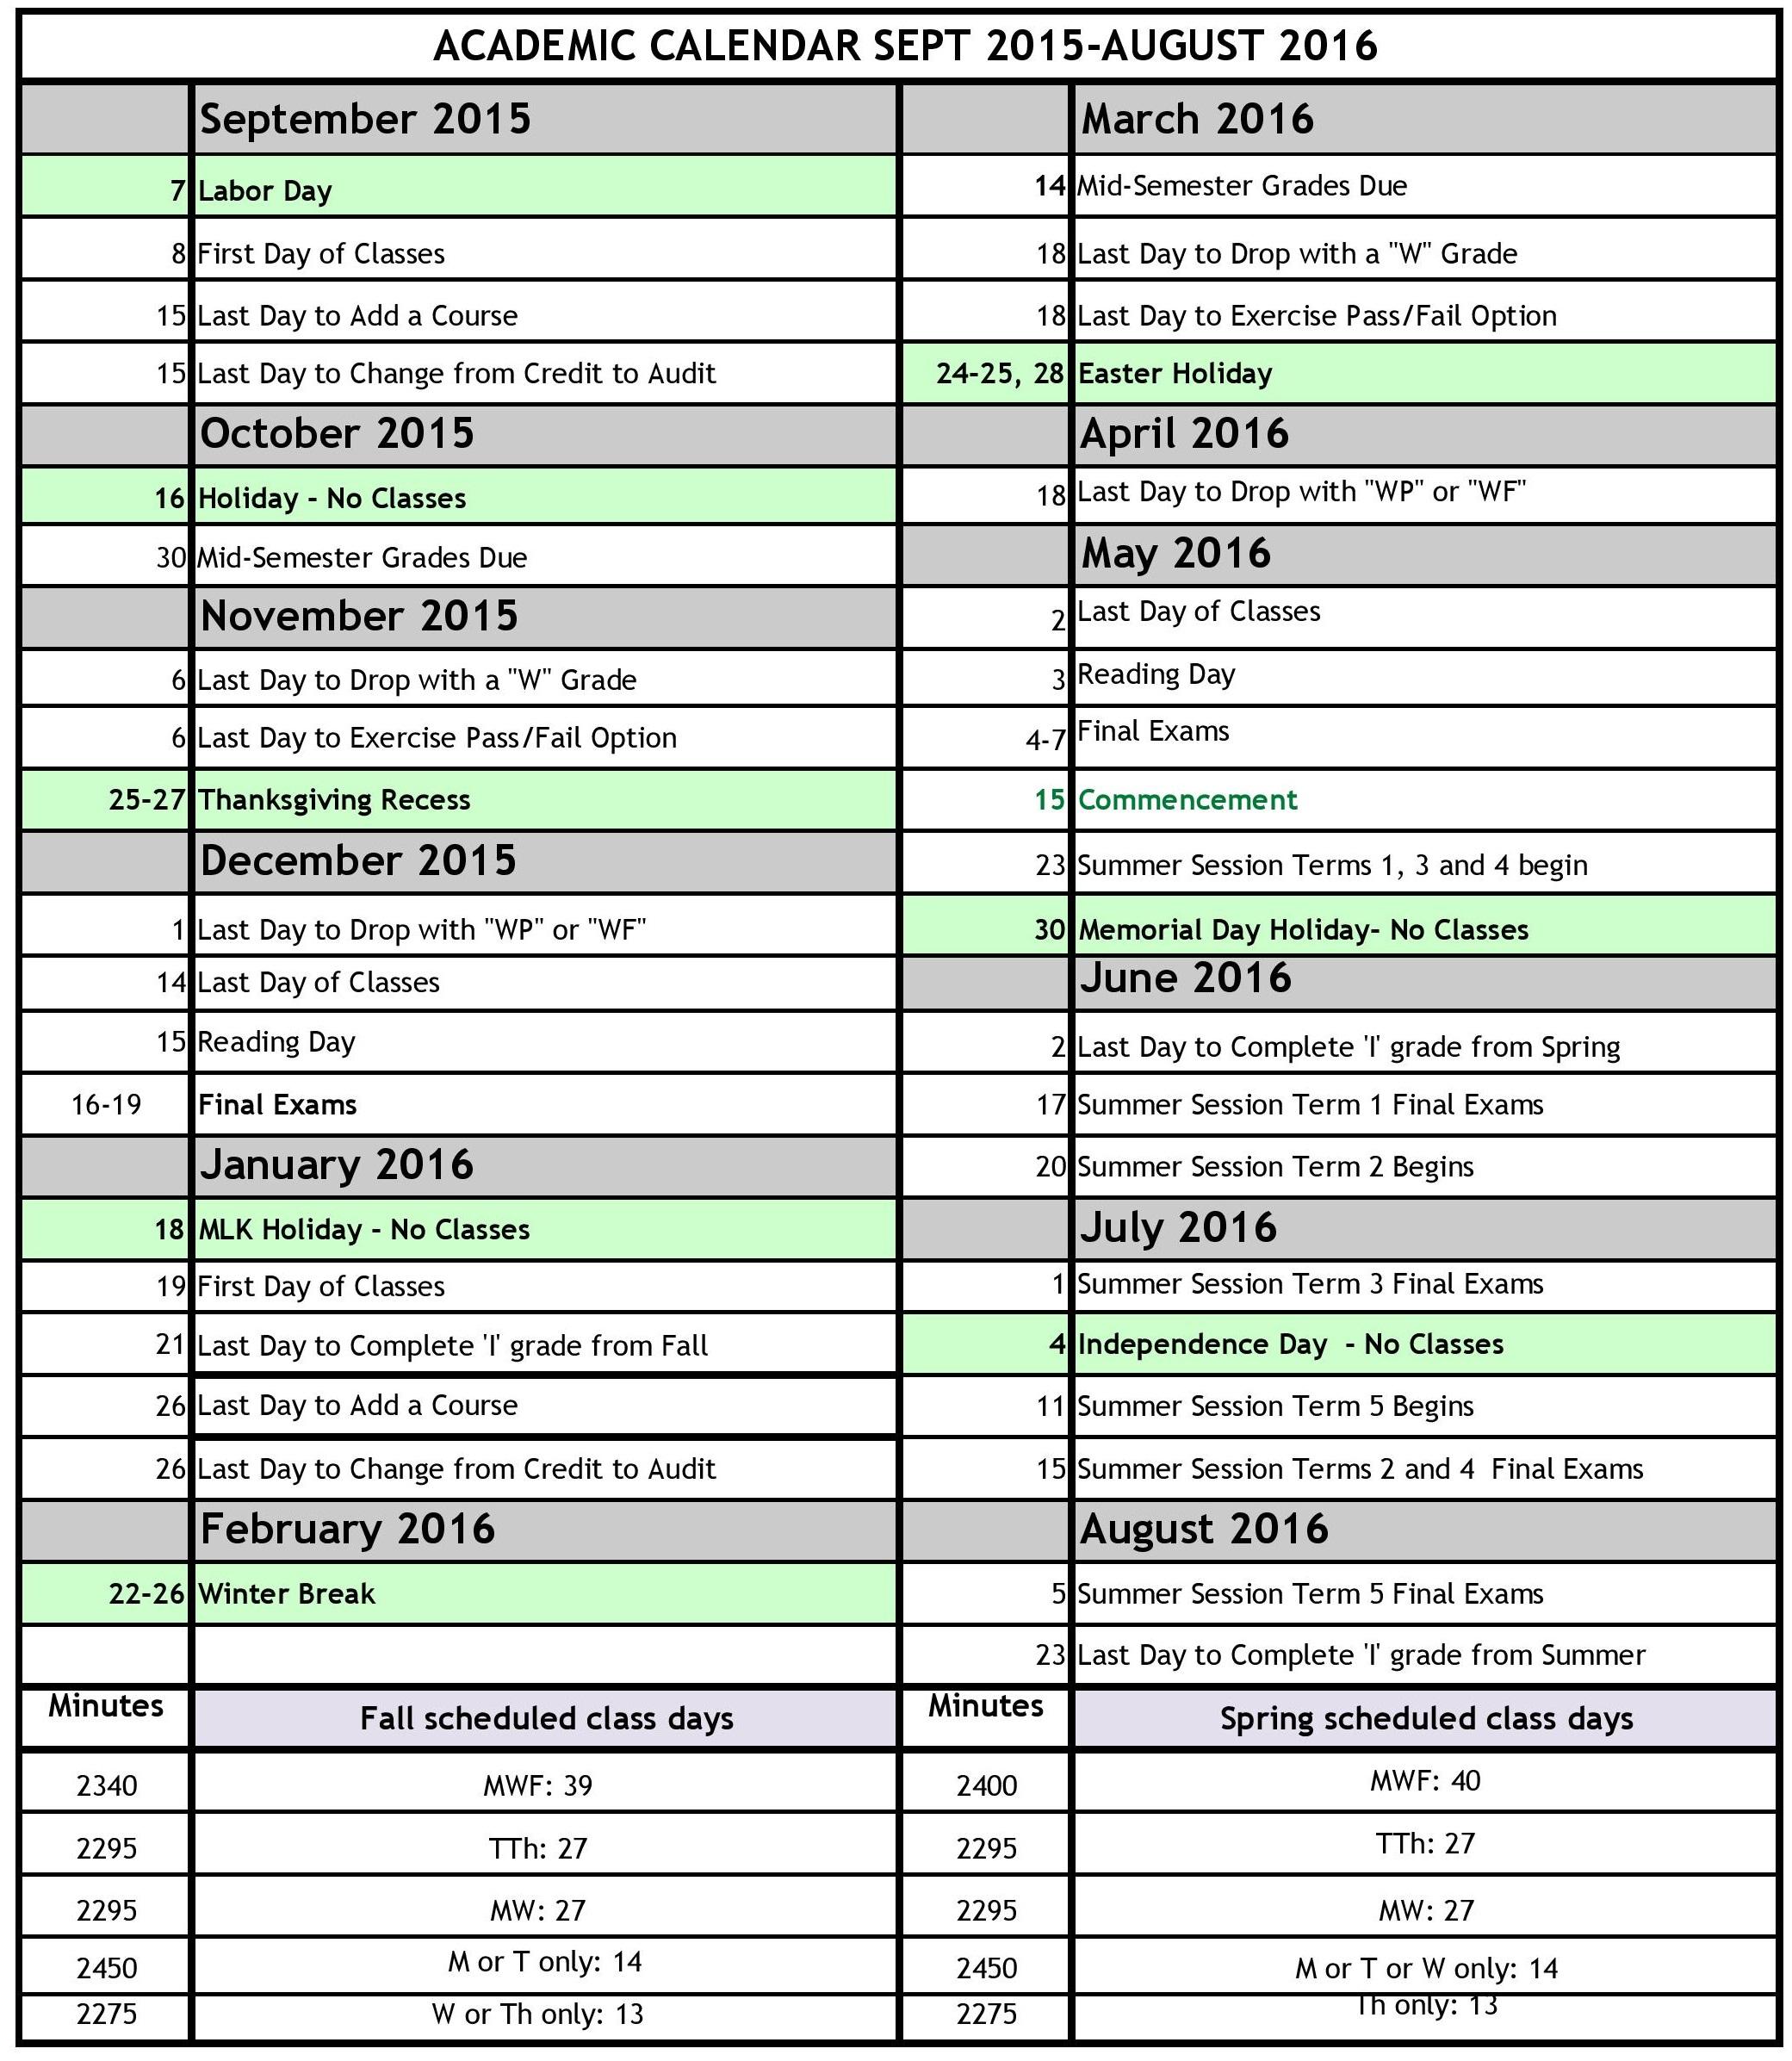 Board Of Education Holiday Calendar Nyc 2016 | Blank Calendar